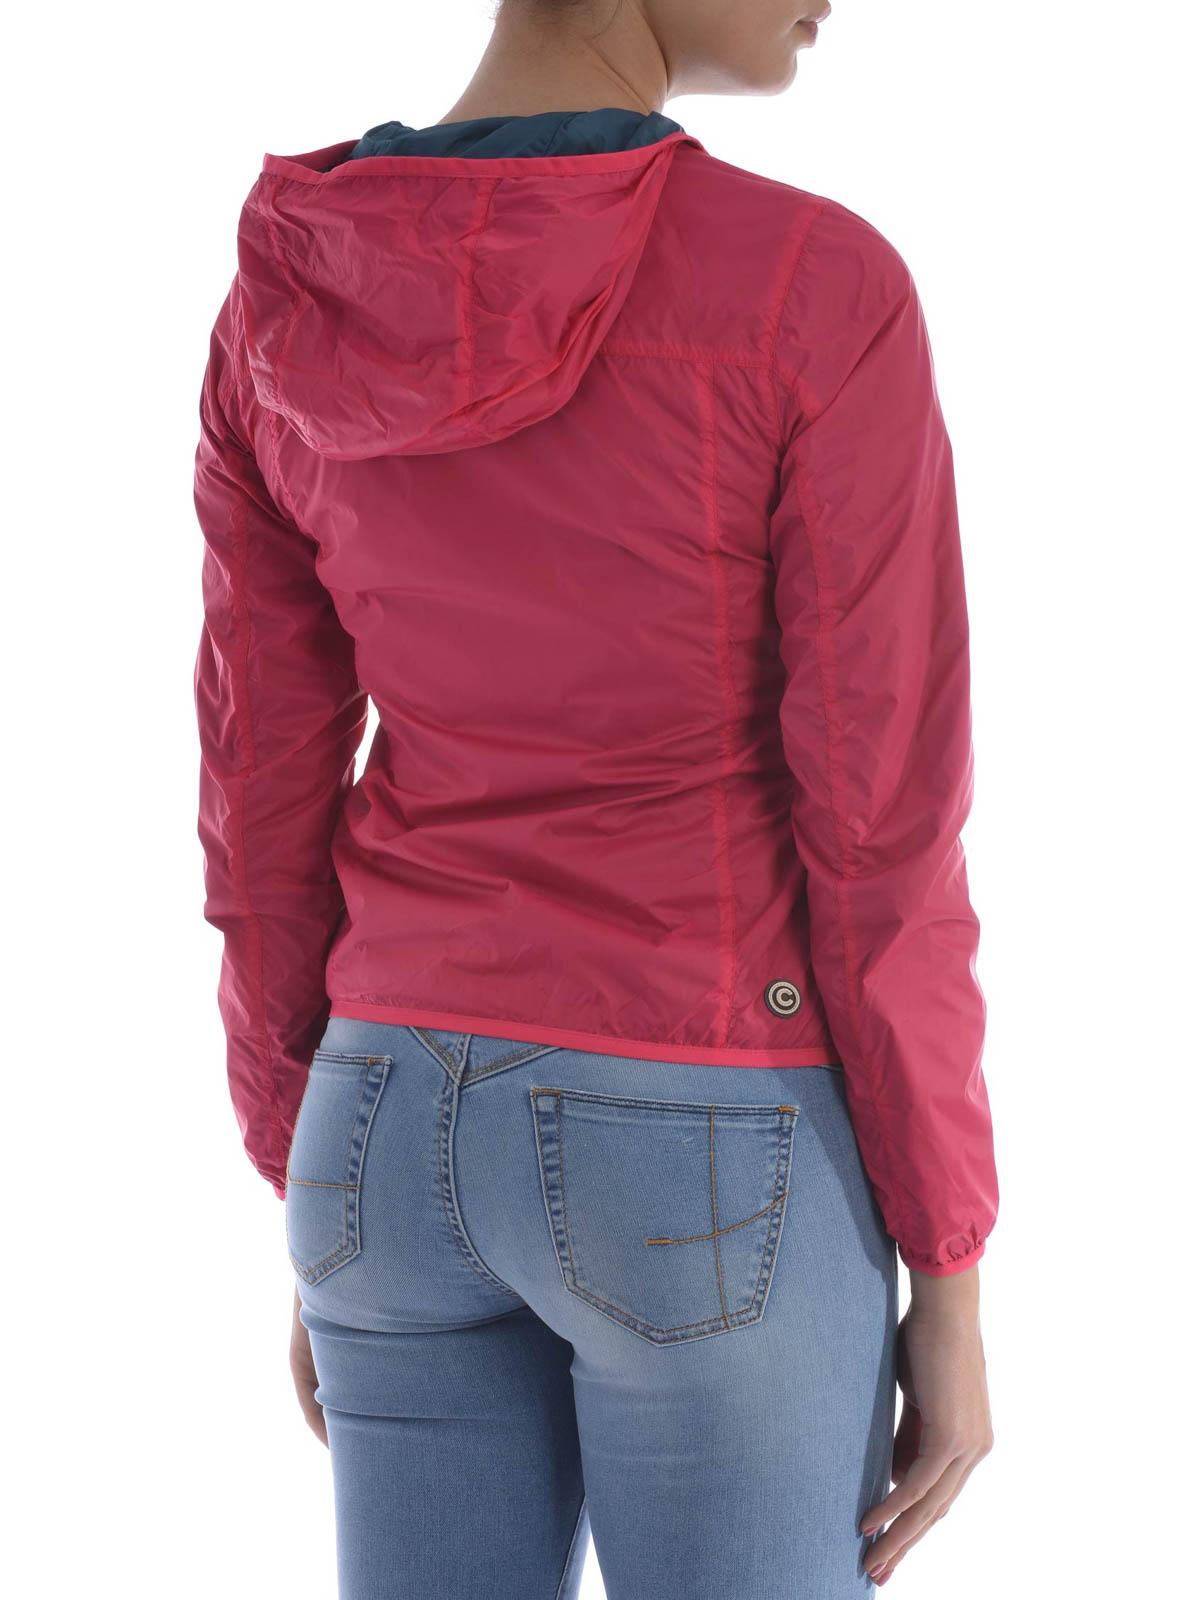 Reversible Nylon Jacket 73